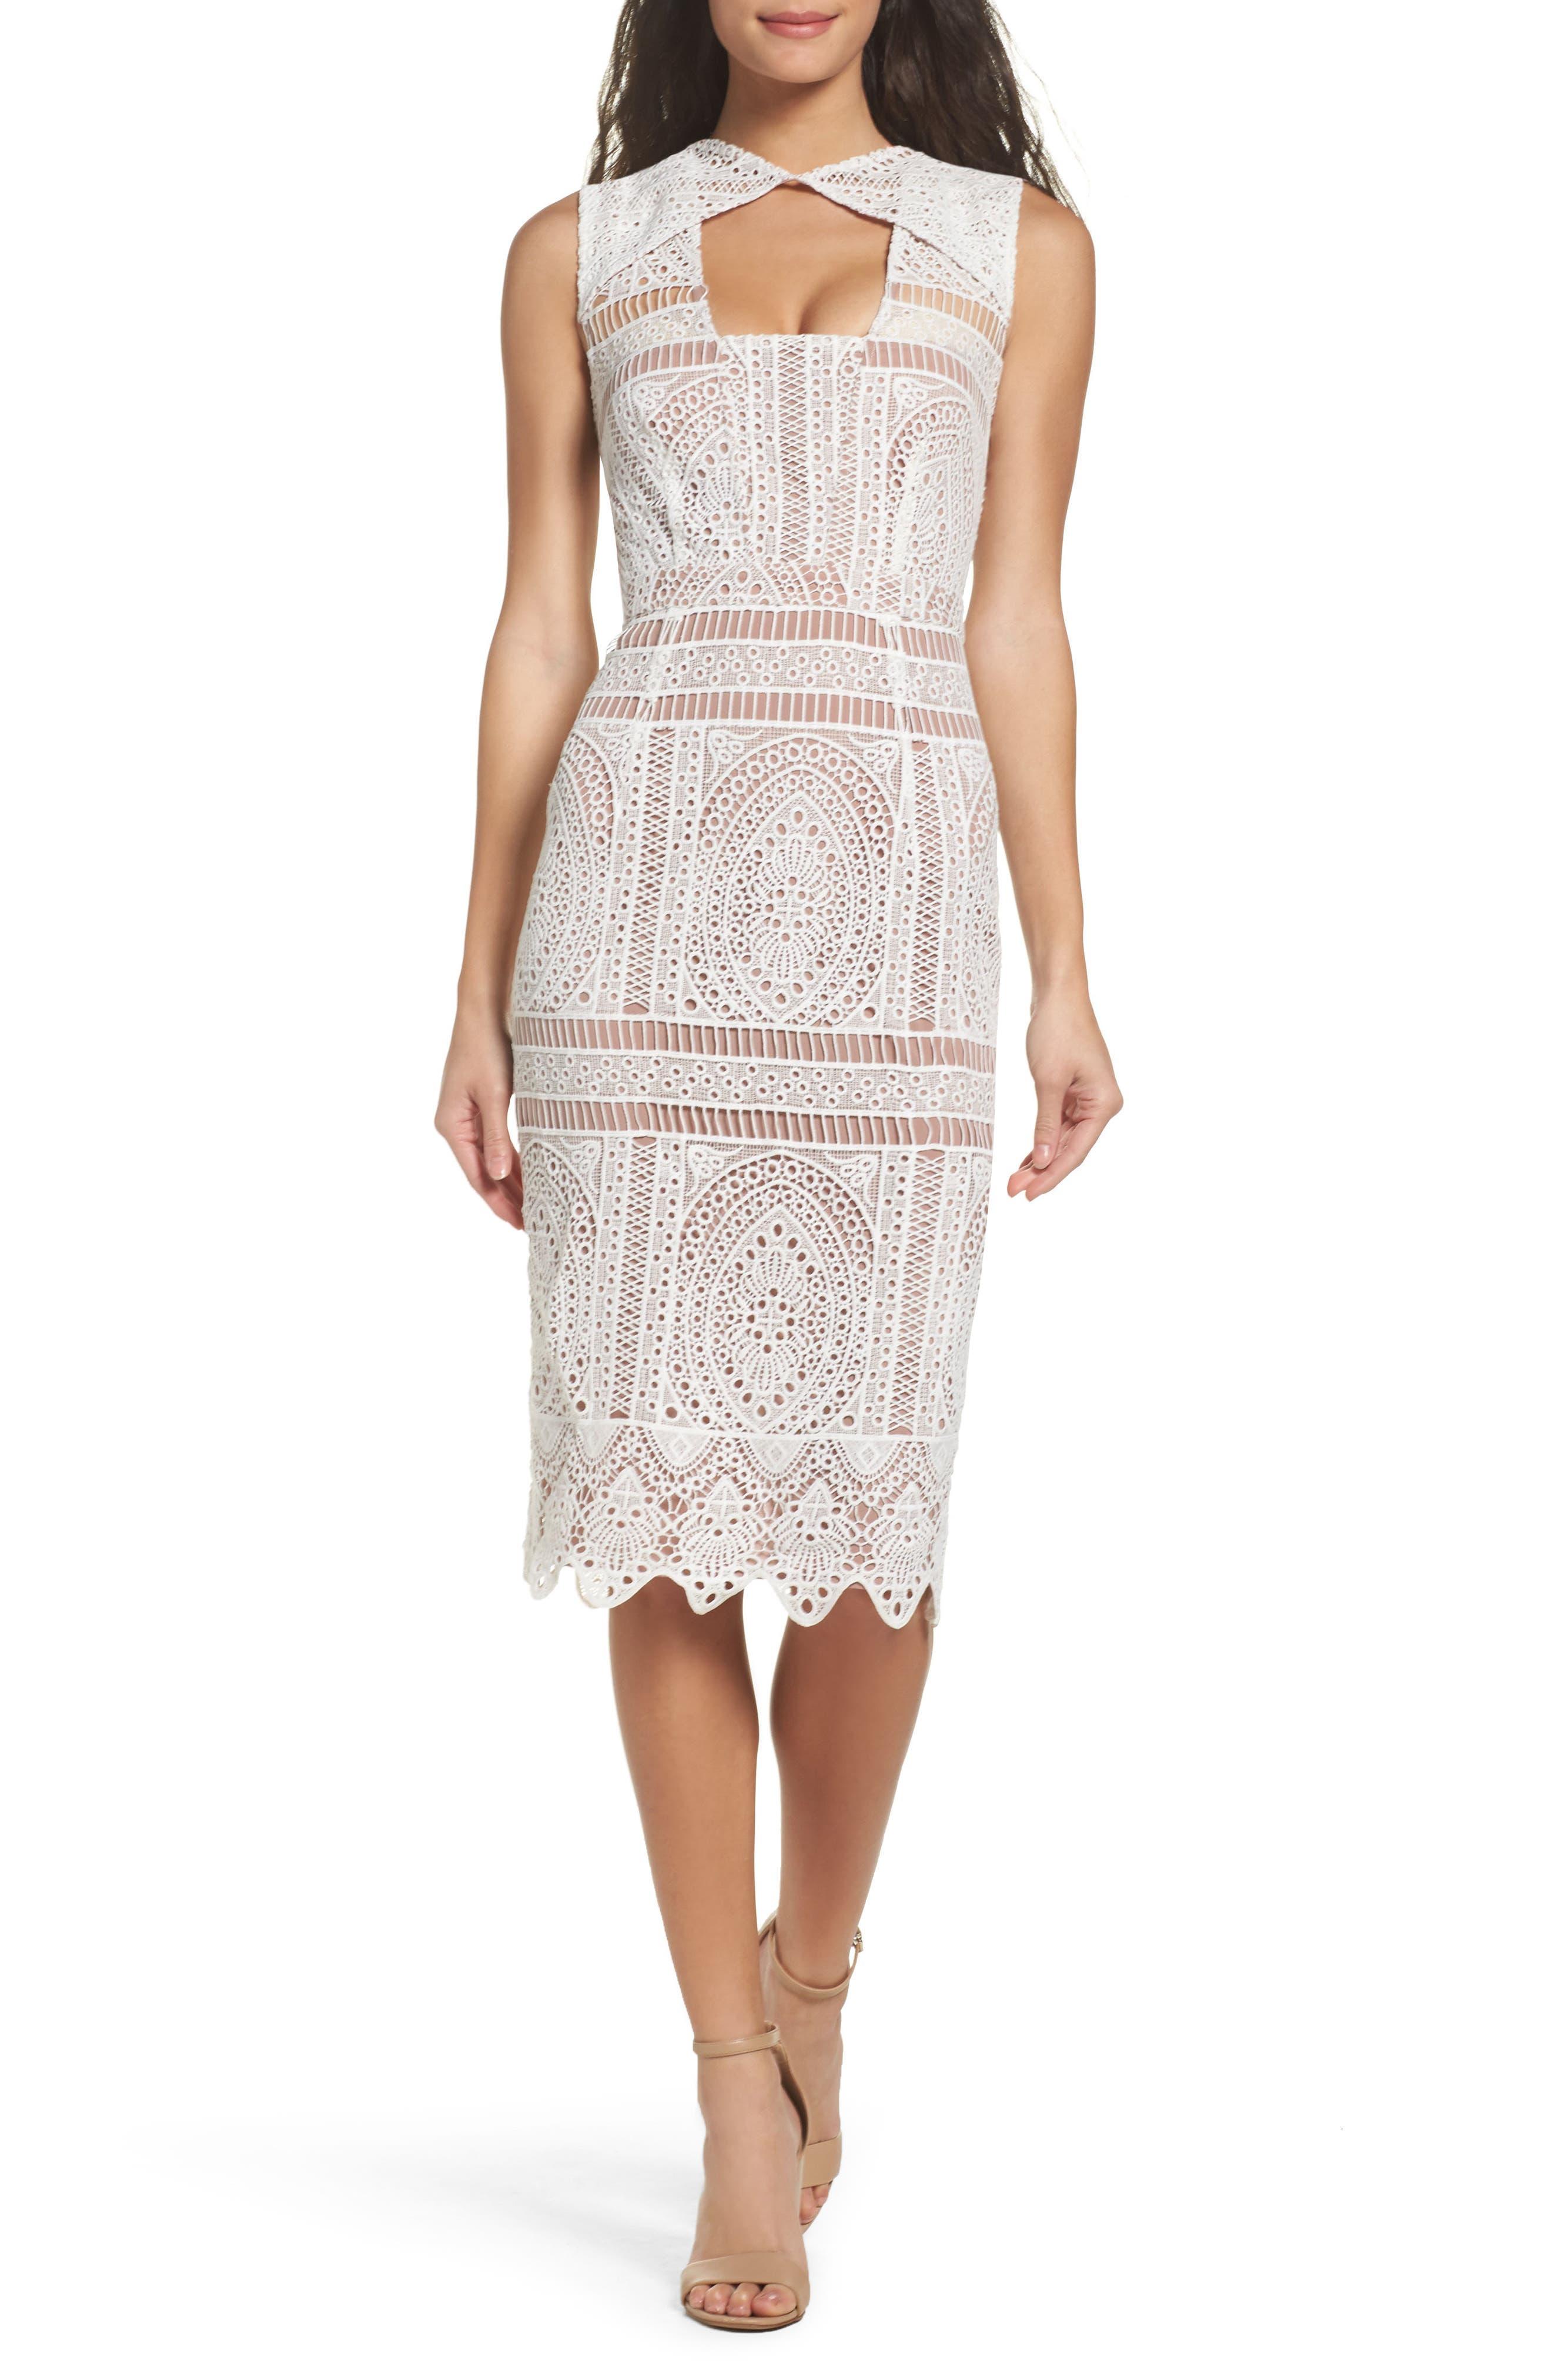 COOPER ST The Last Hurrah Sheath Dress